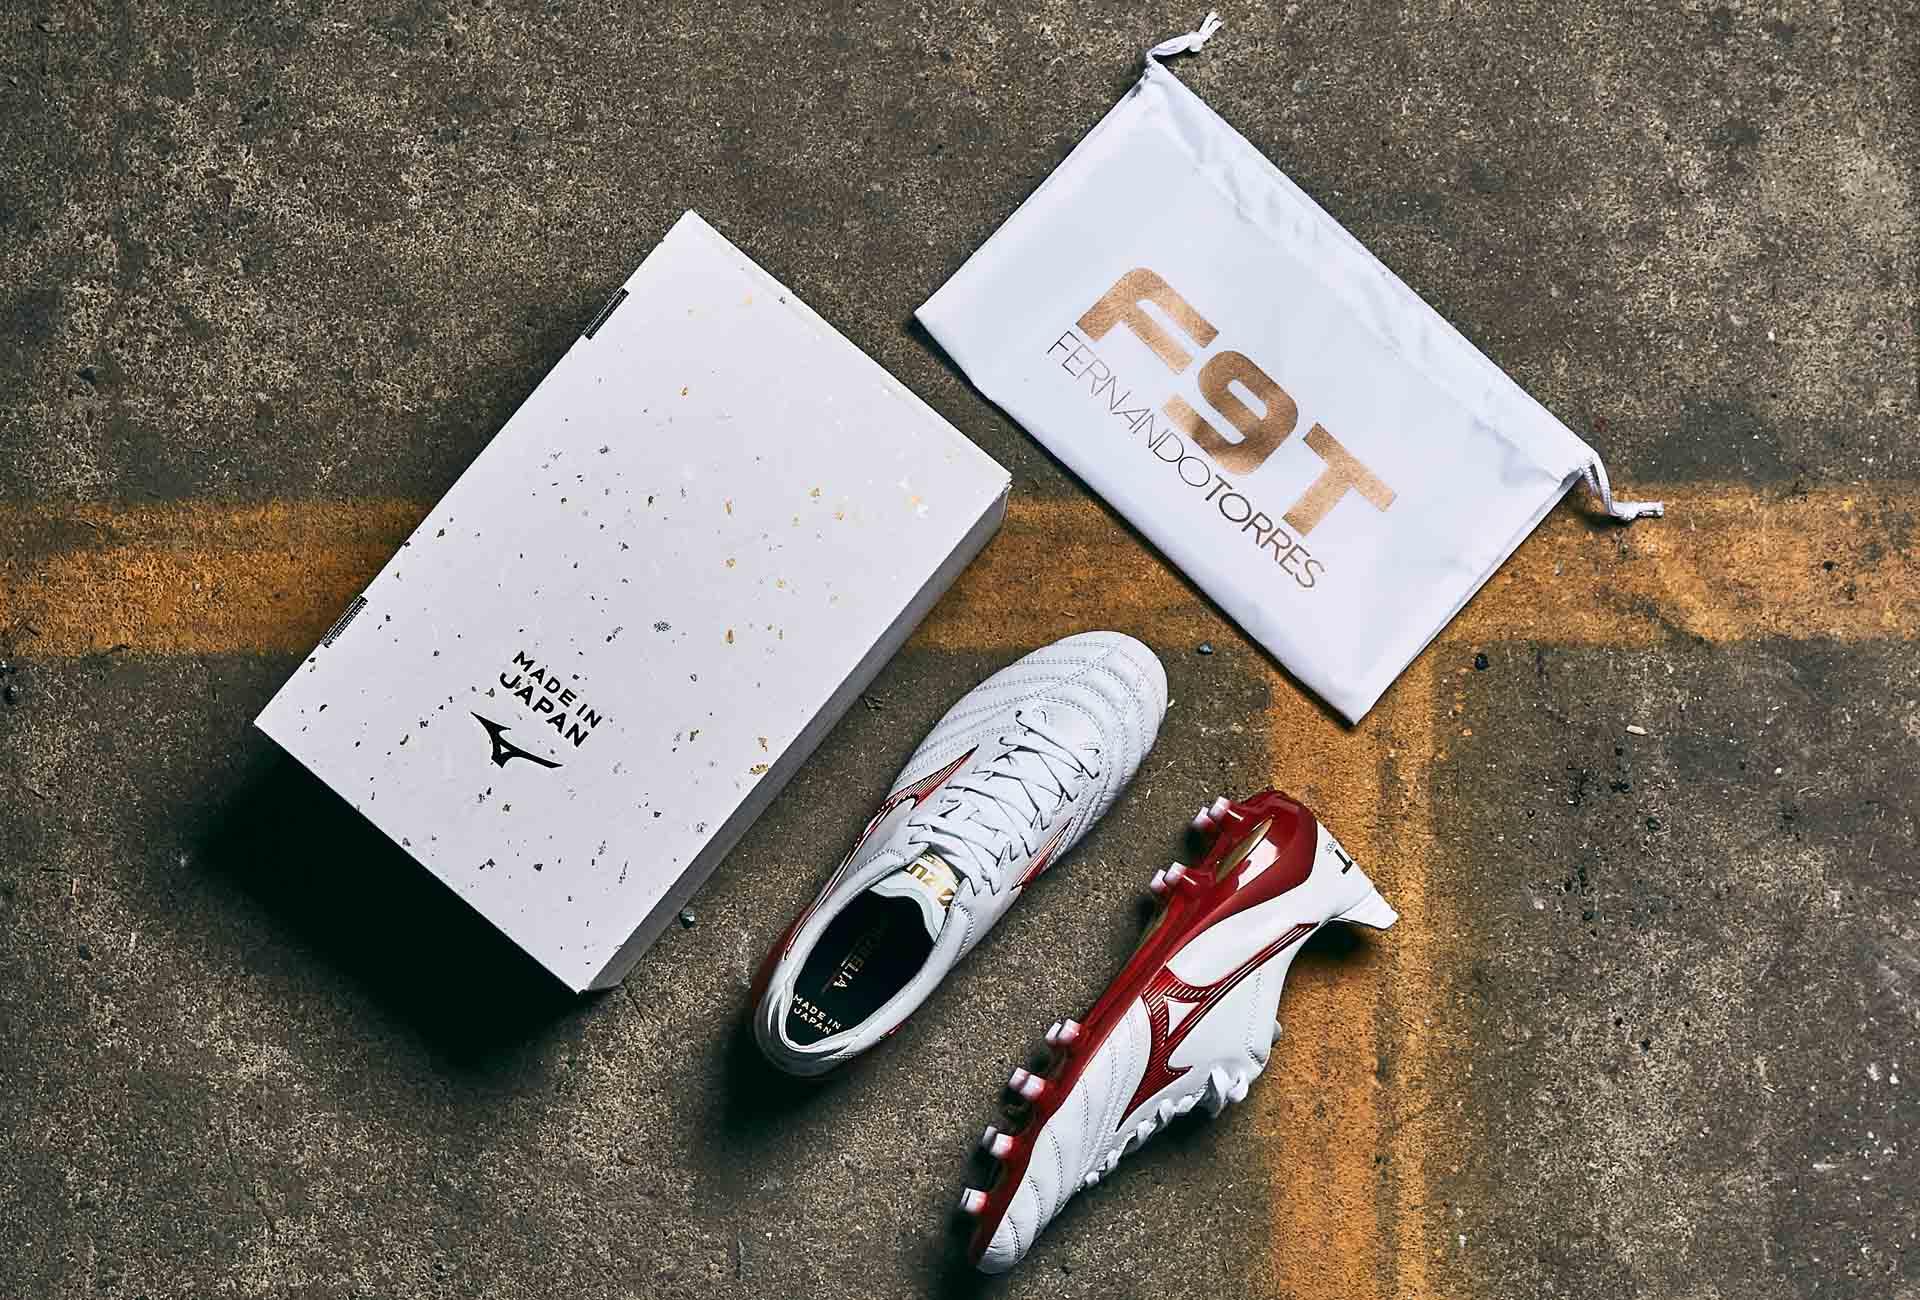 Mizuno tung ra mẫu giày Morelia Neo II F9T của tiền đạo Fernando Torres